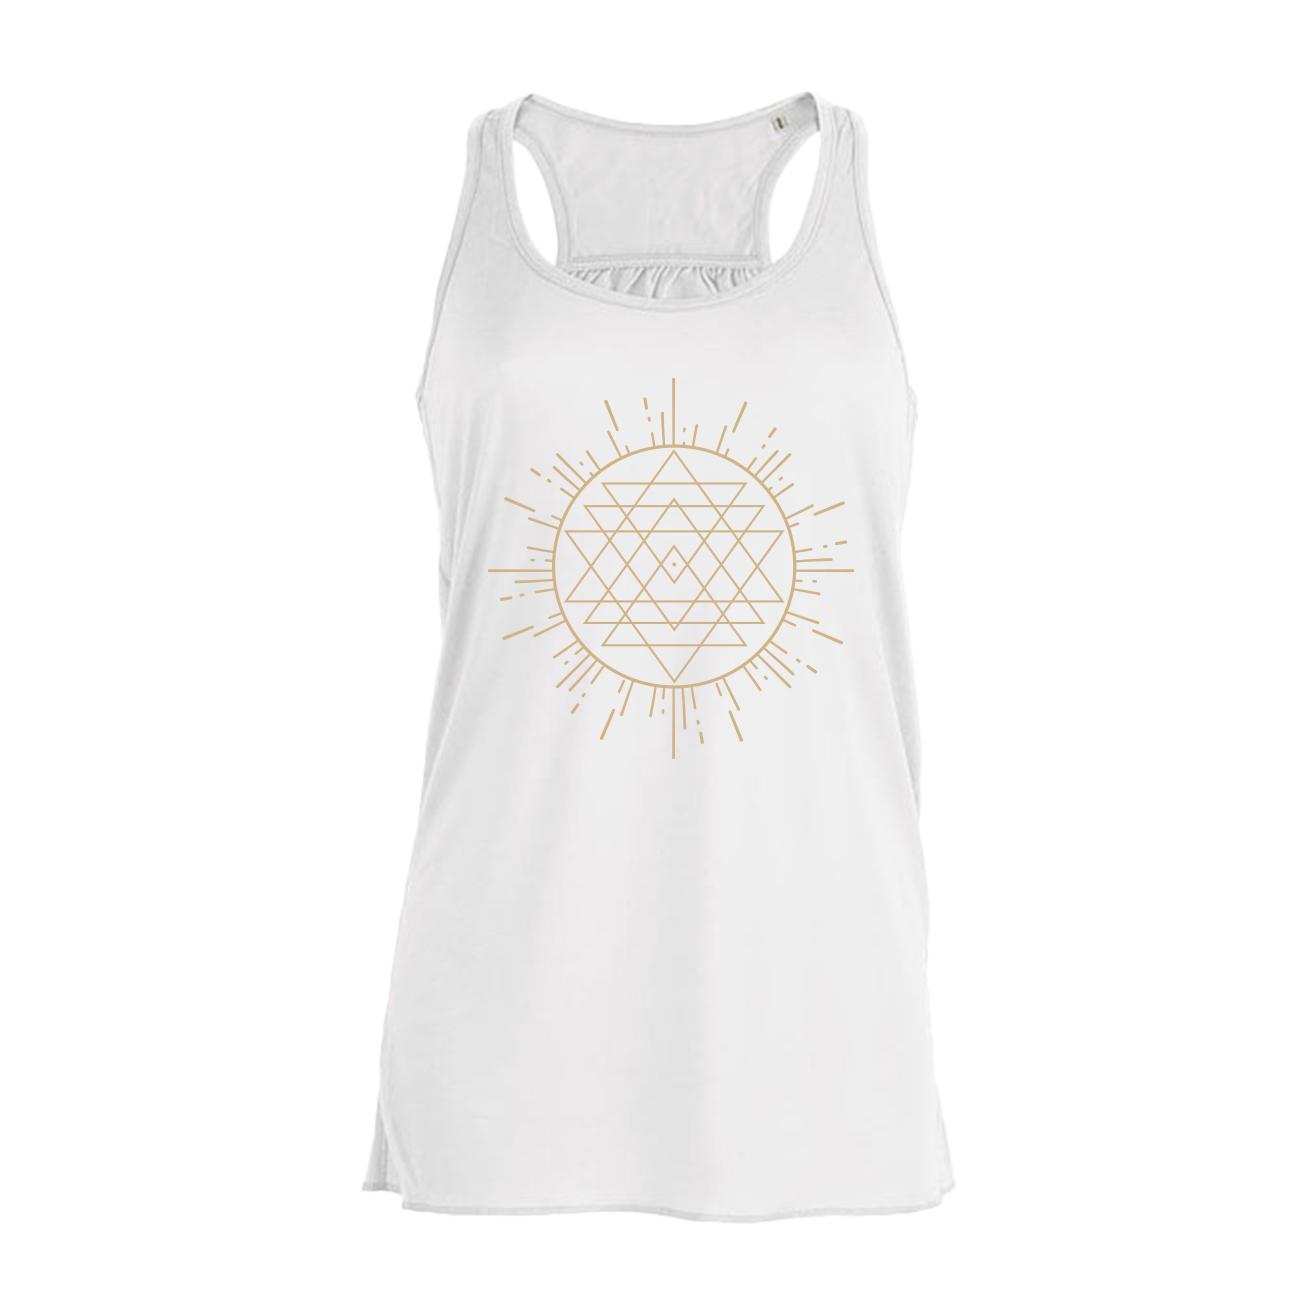 Erdenkind / SHRI LAKSHMI Tank - nachhaltige Yoga Bekleidung